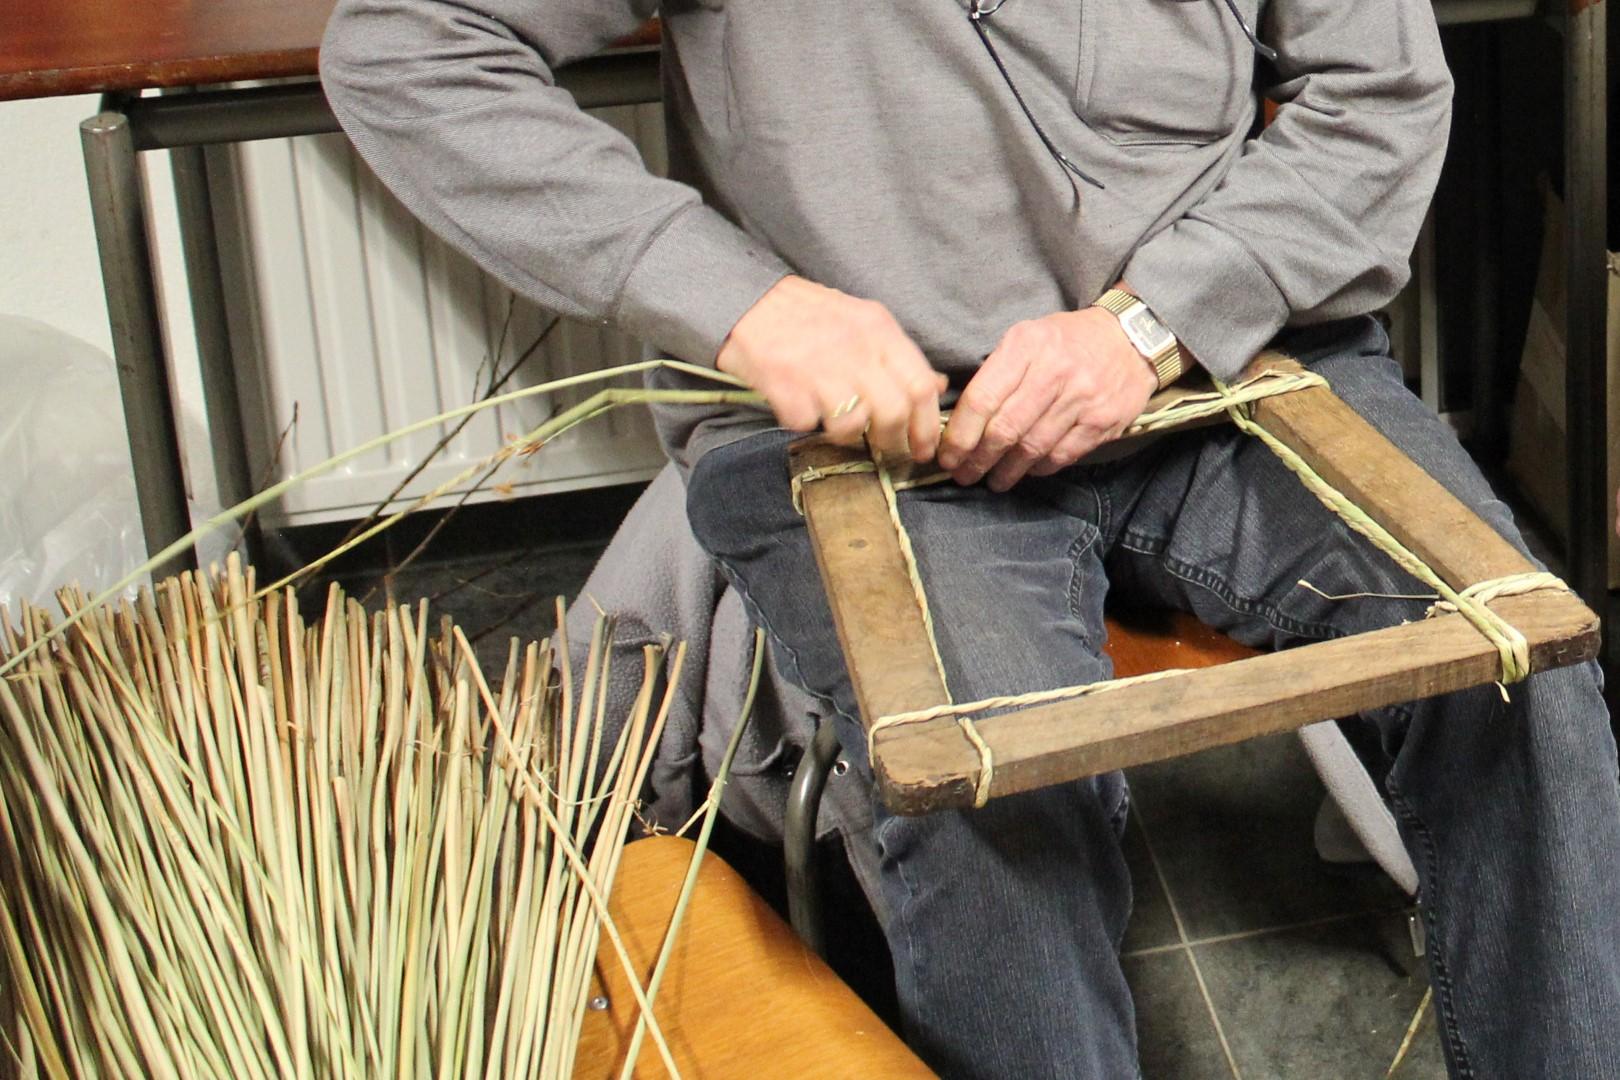 Cursussen oude ambachten bij Onstwedder Gaarv'n: stoelen matten.